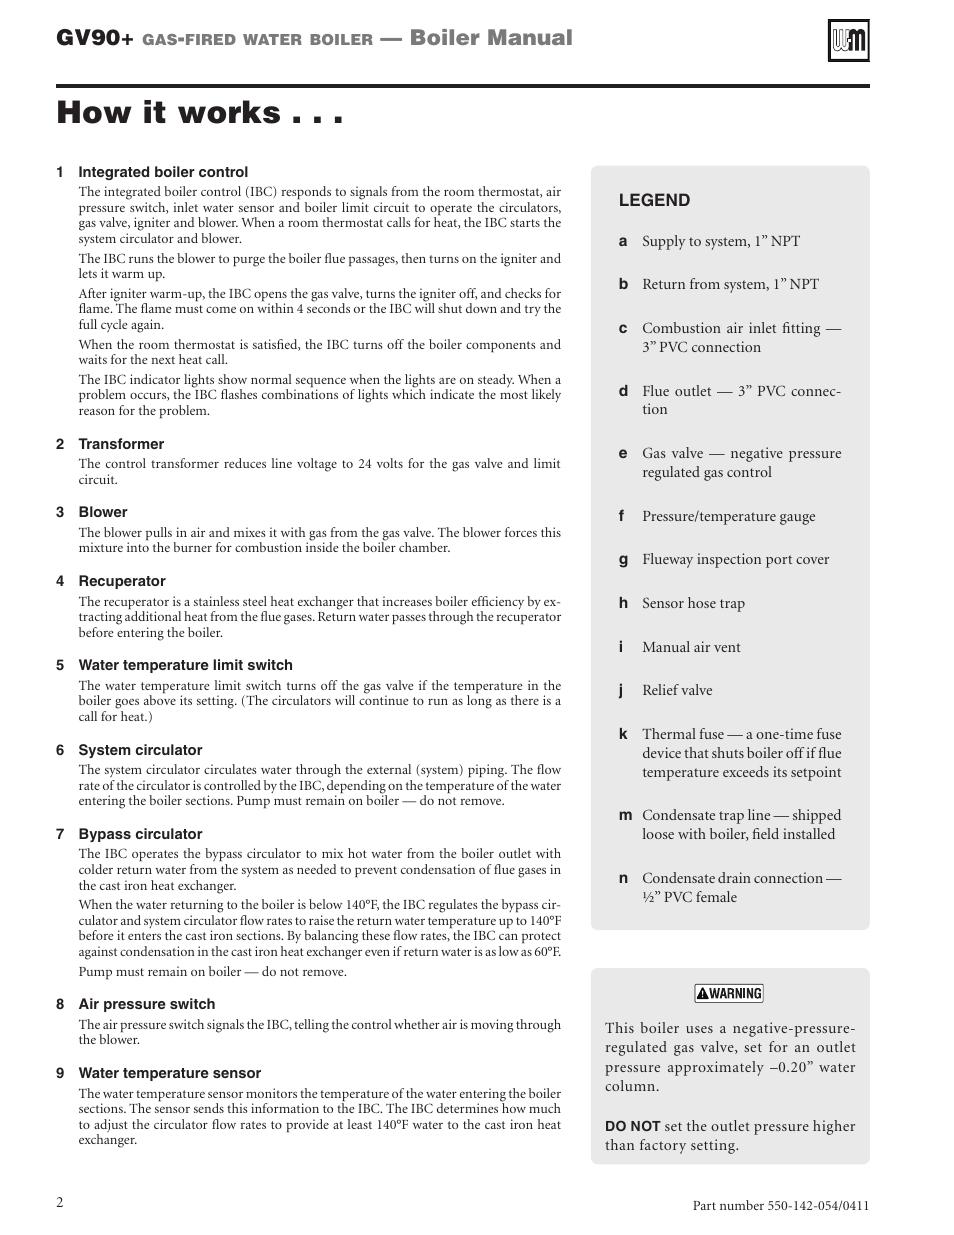 How it works, Gv90, Boiler manual | Weil-McLain GV90+ User Manual ...